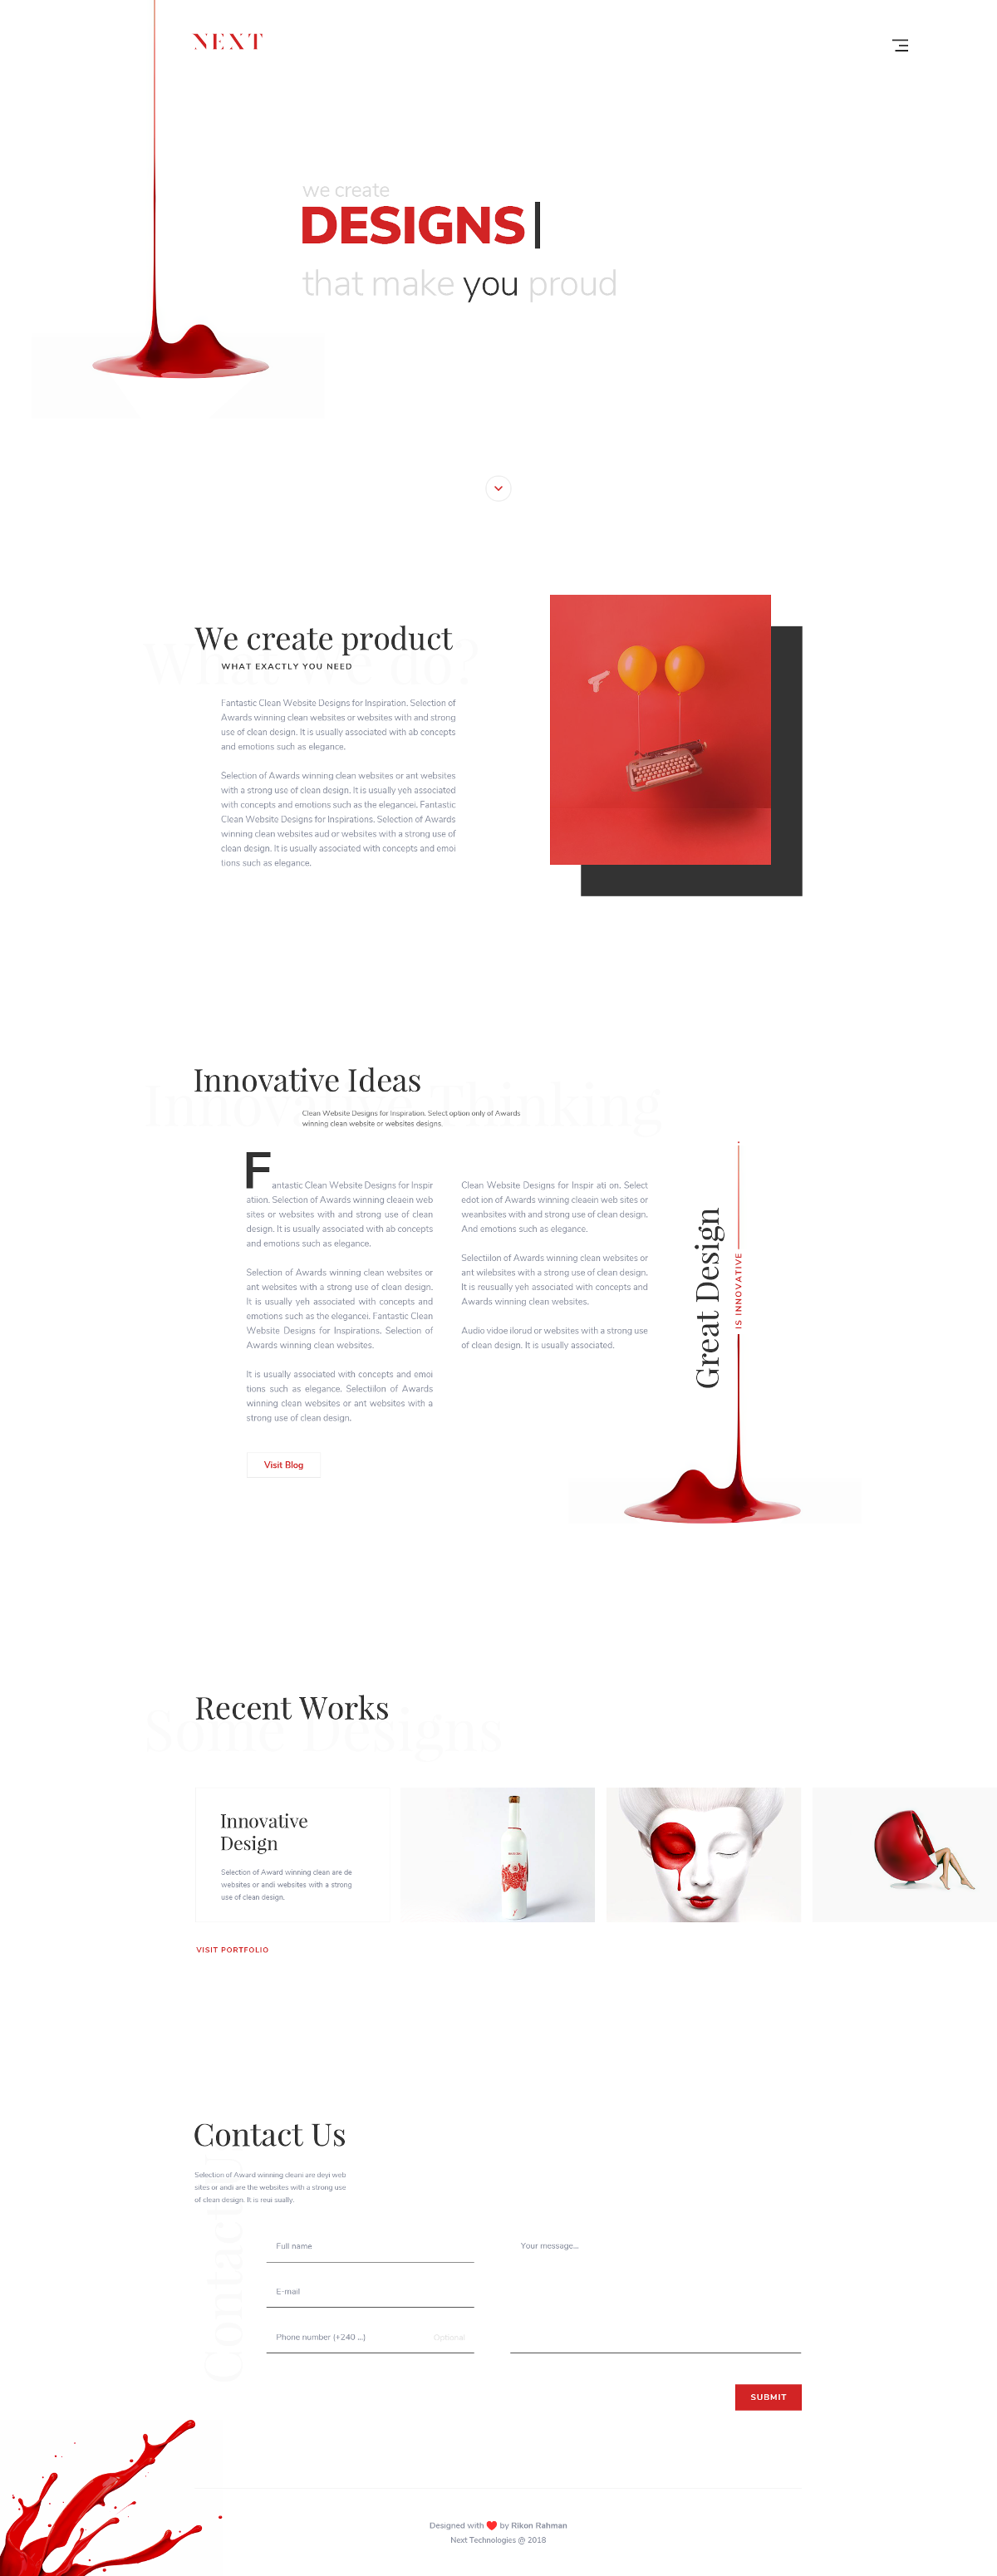 Next - Free Digital Agency Landing Page Template